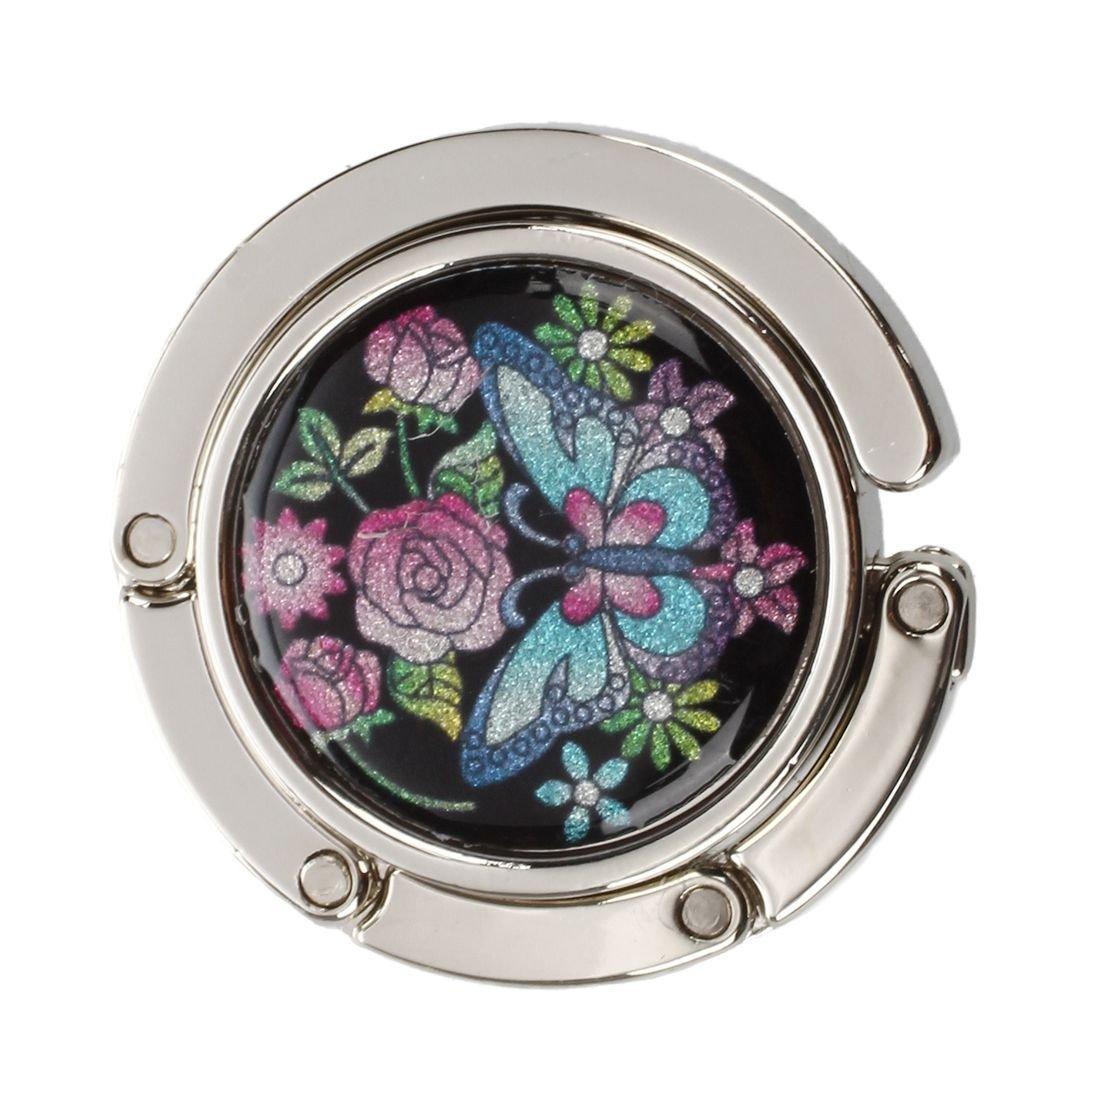 TOOGOO(R) Sac a main pliable avec crochet colore en metal en forme ronde du motif de papillon SHOMAGT11367